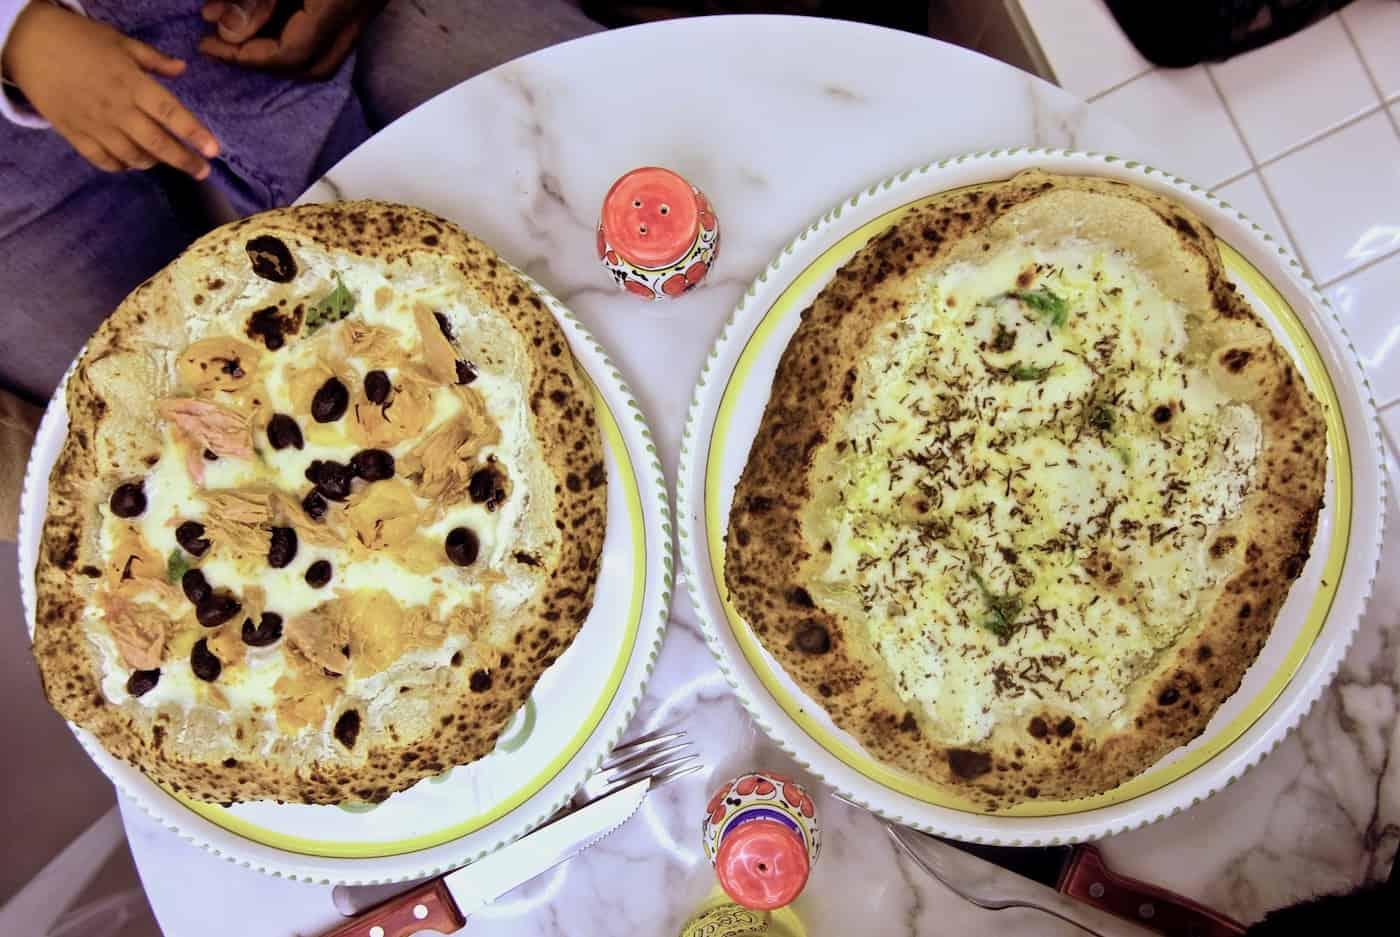 dalmata-pizza-rue-tiquetonne-paris-2eme